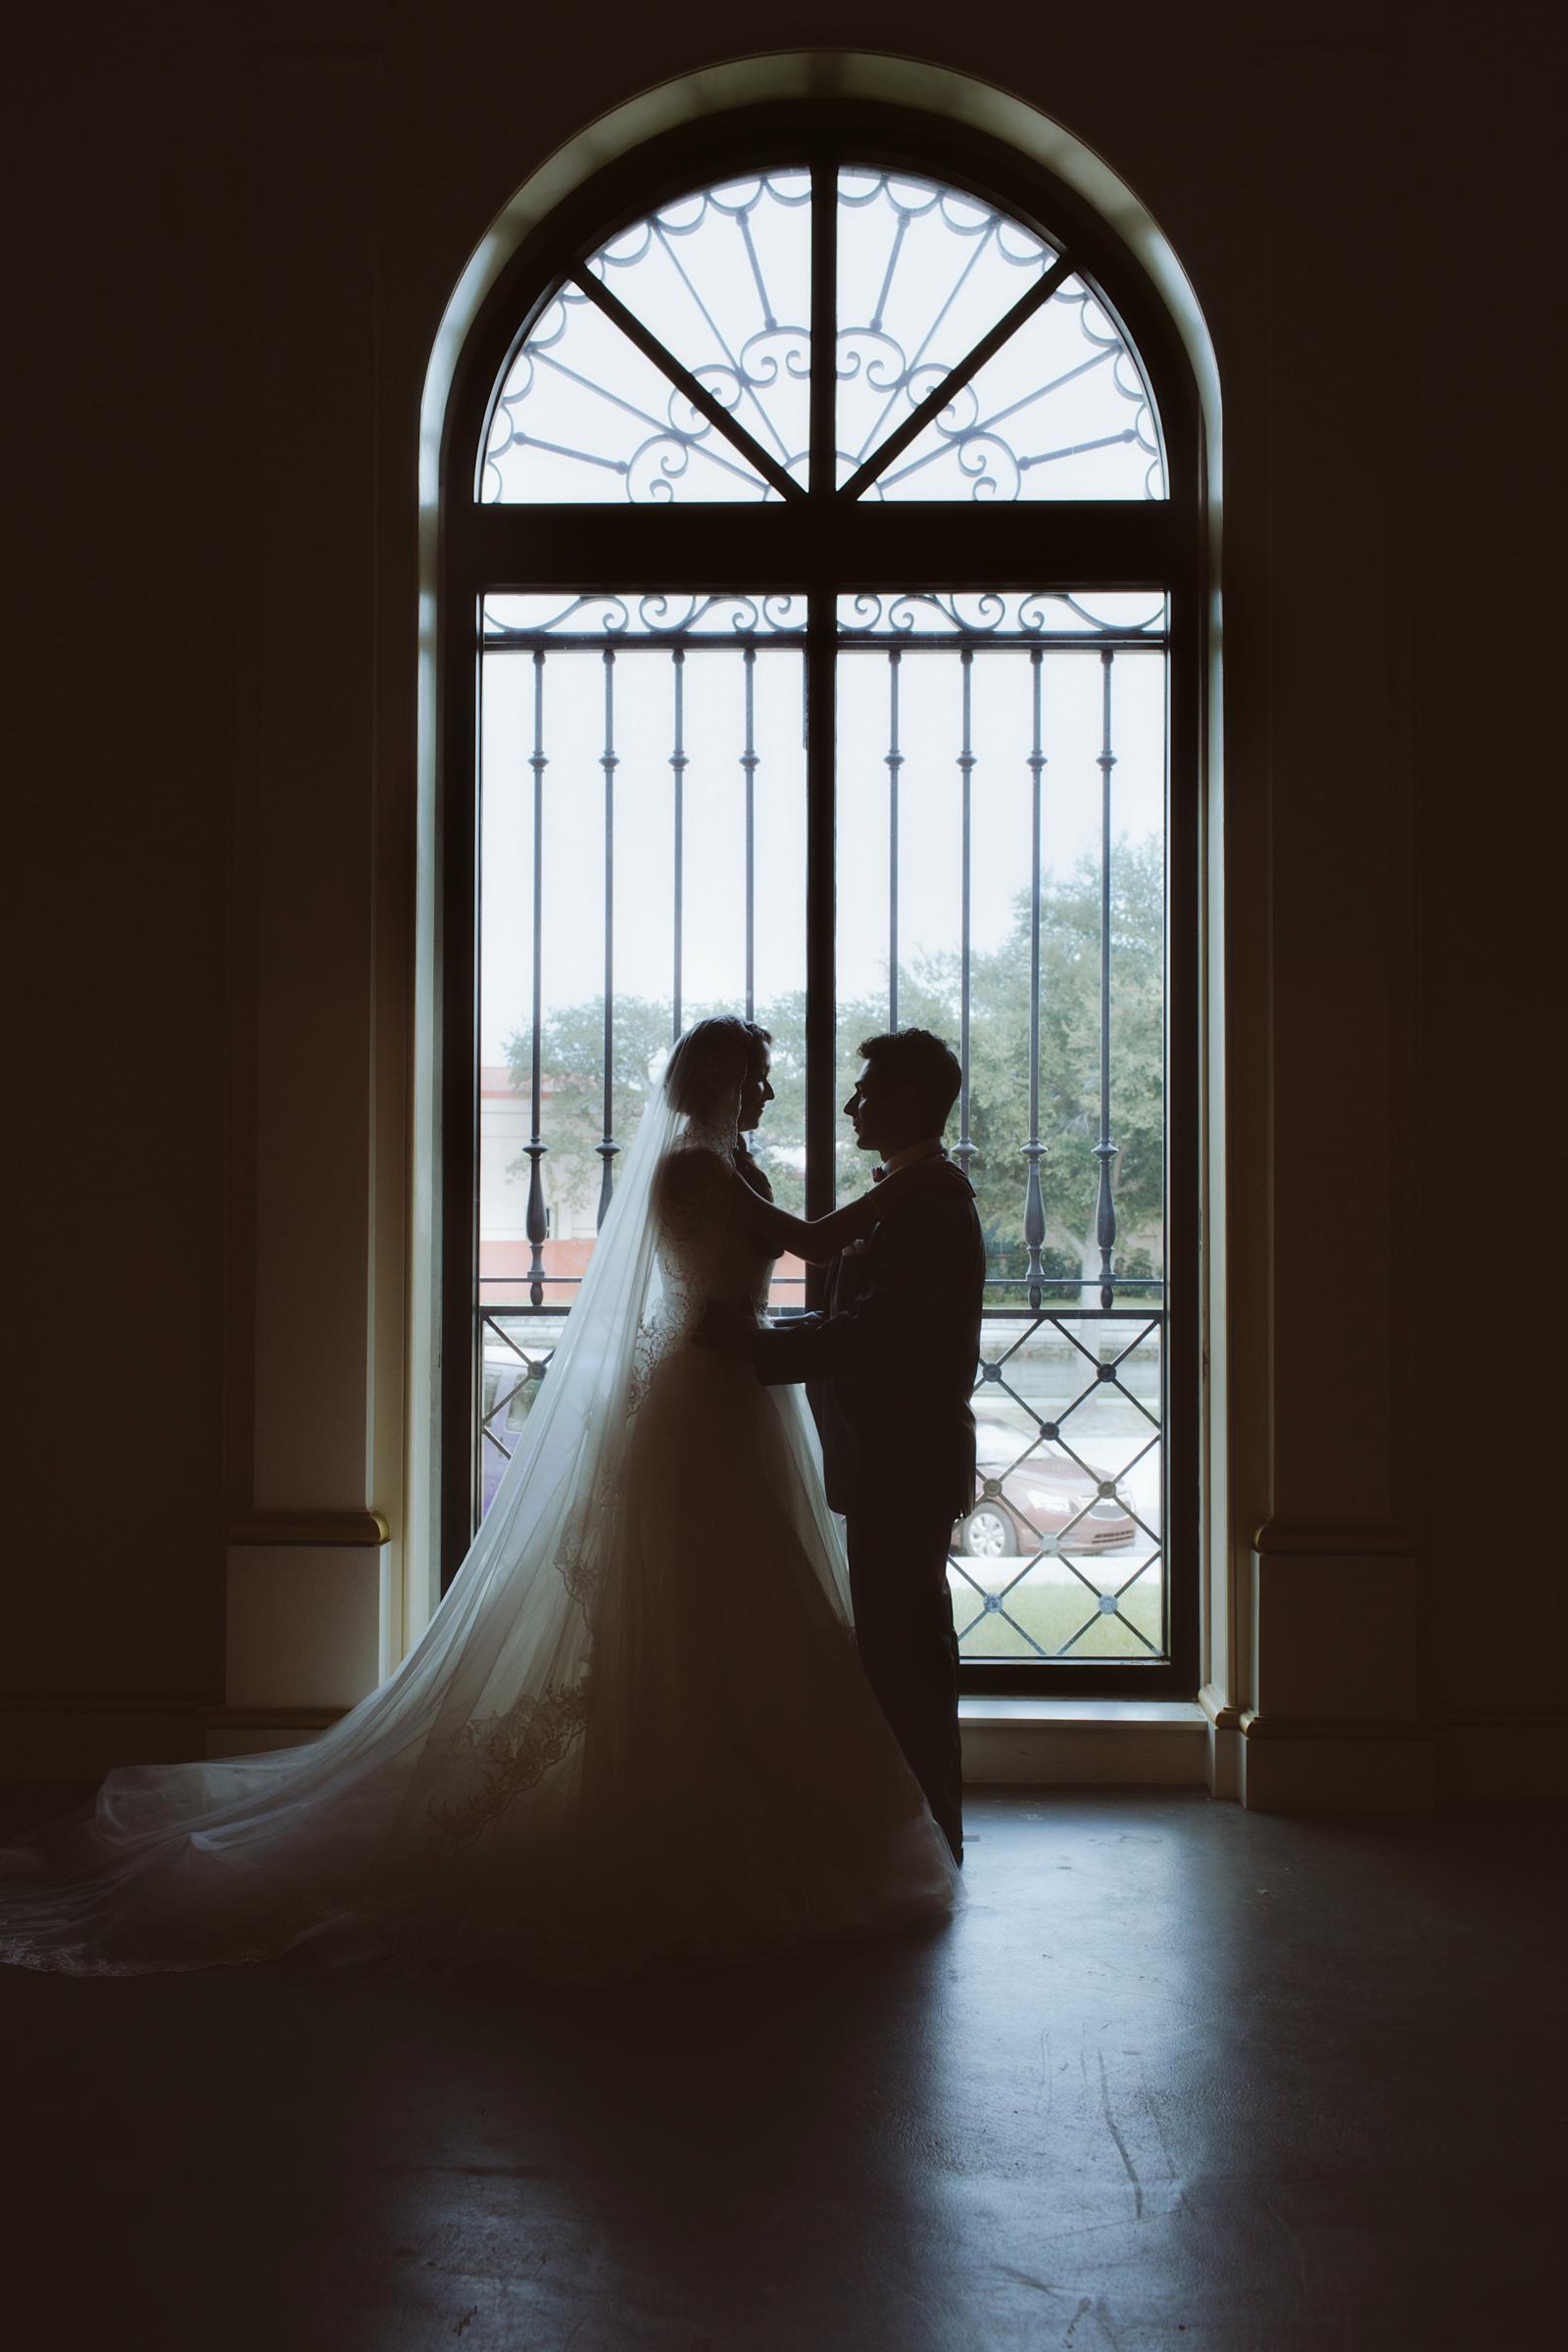 wedding day | MFA St Pete | Vanessa Boy Photography | vanessaboy.com-257.com |final.jpg